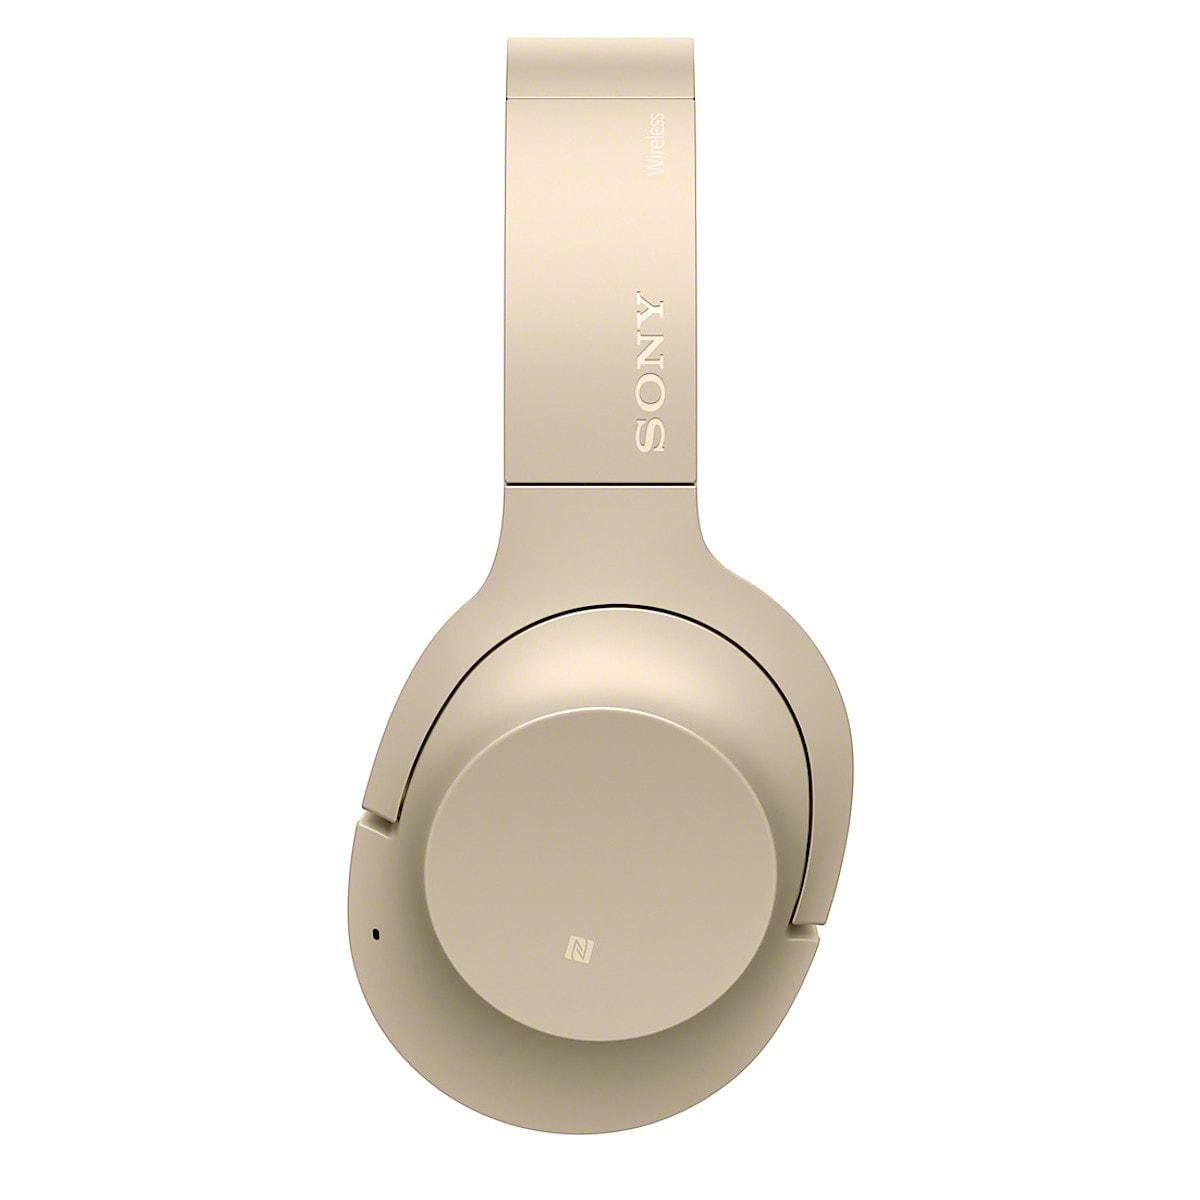 Trådlösa hörlurar med mikrofon, Sony WH-H900N